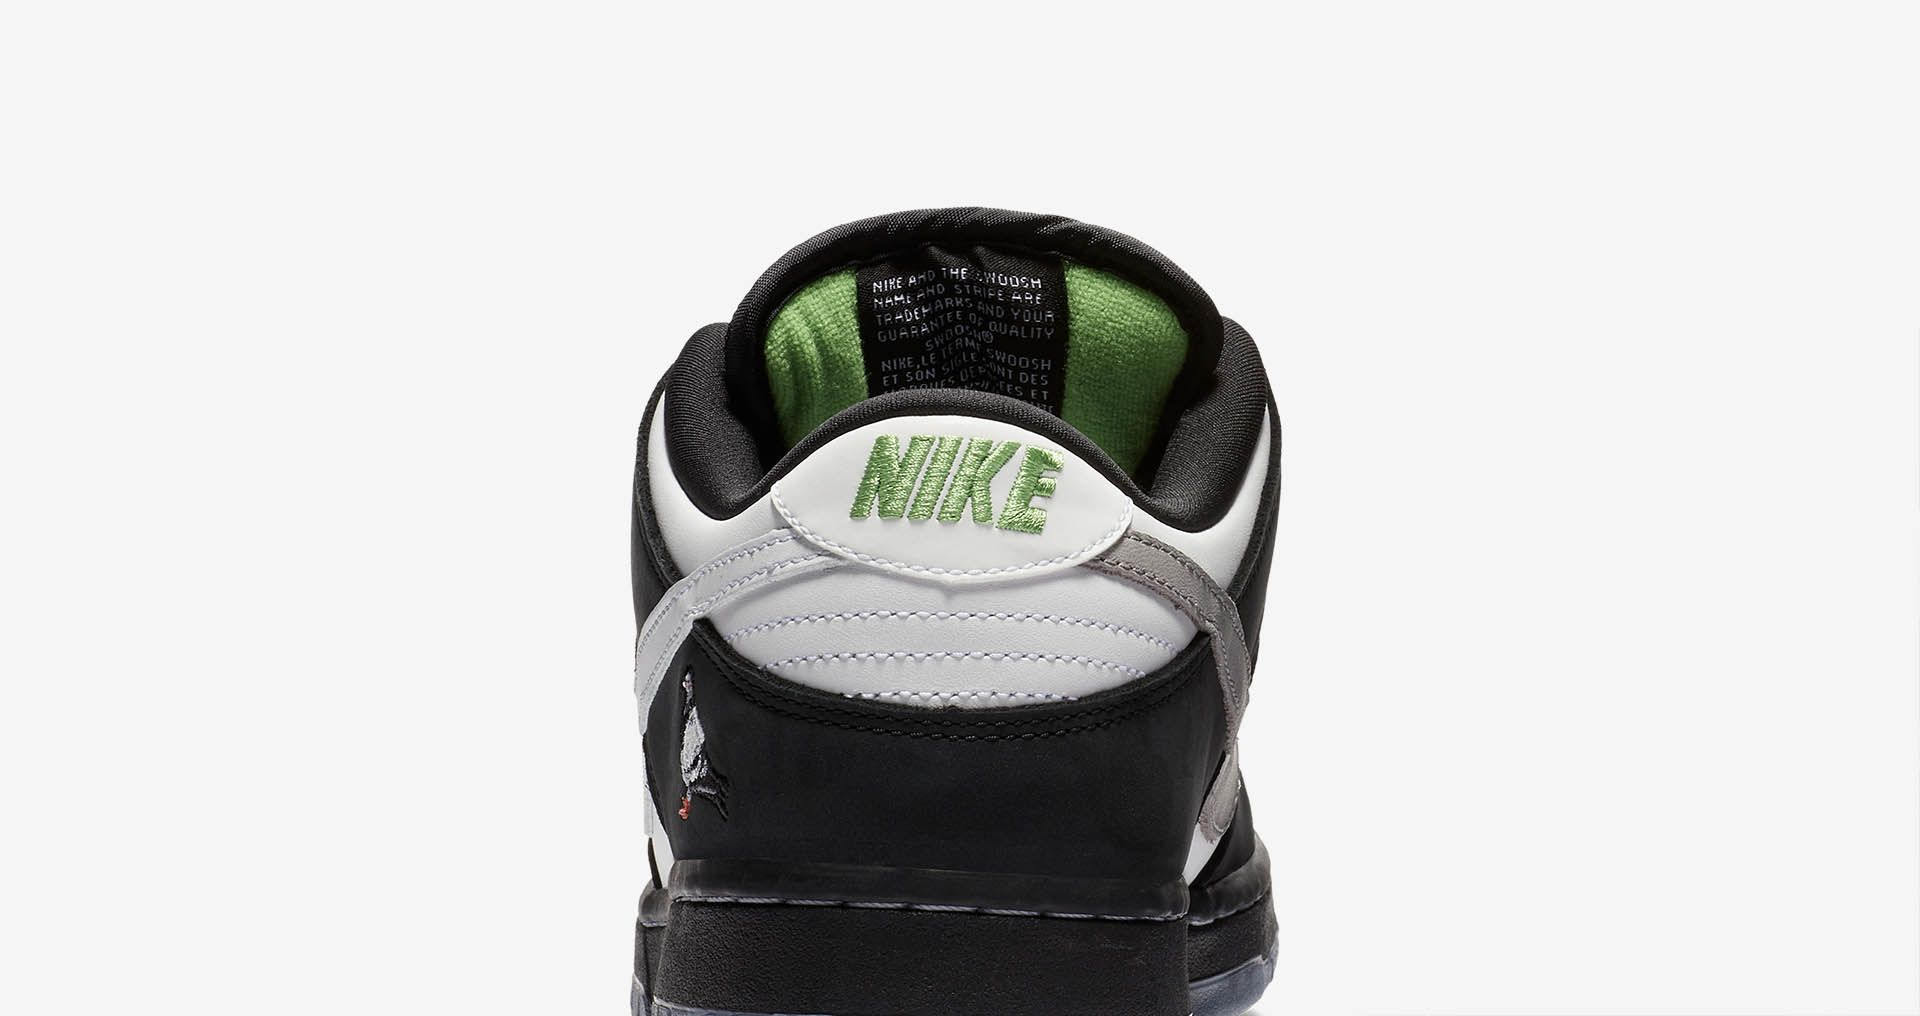 cheap for discount 73e89 1a633 Nike SB Dunk Low Pro  Panda Pigeon  Release Date